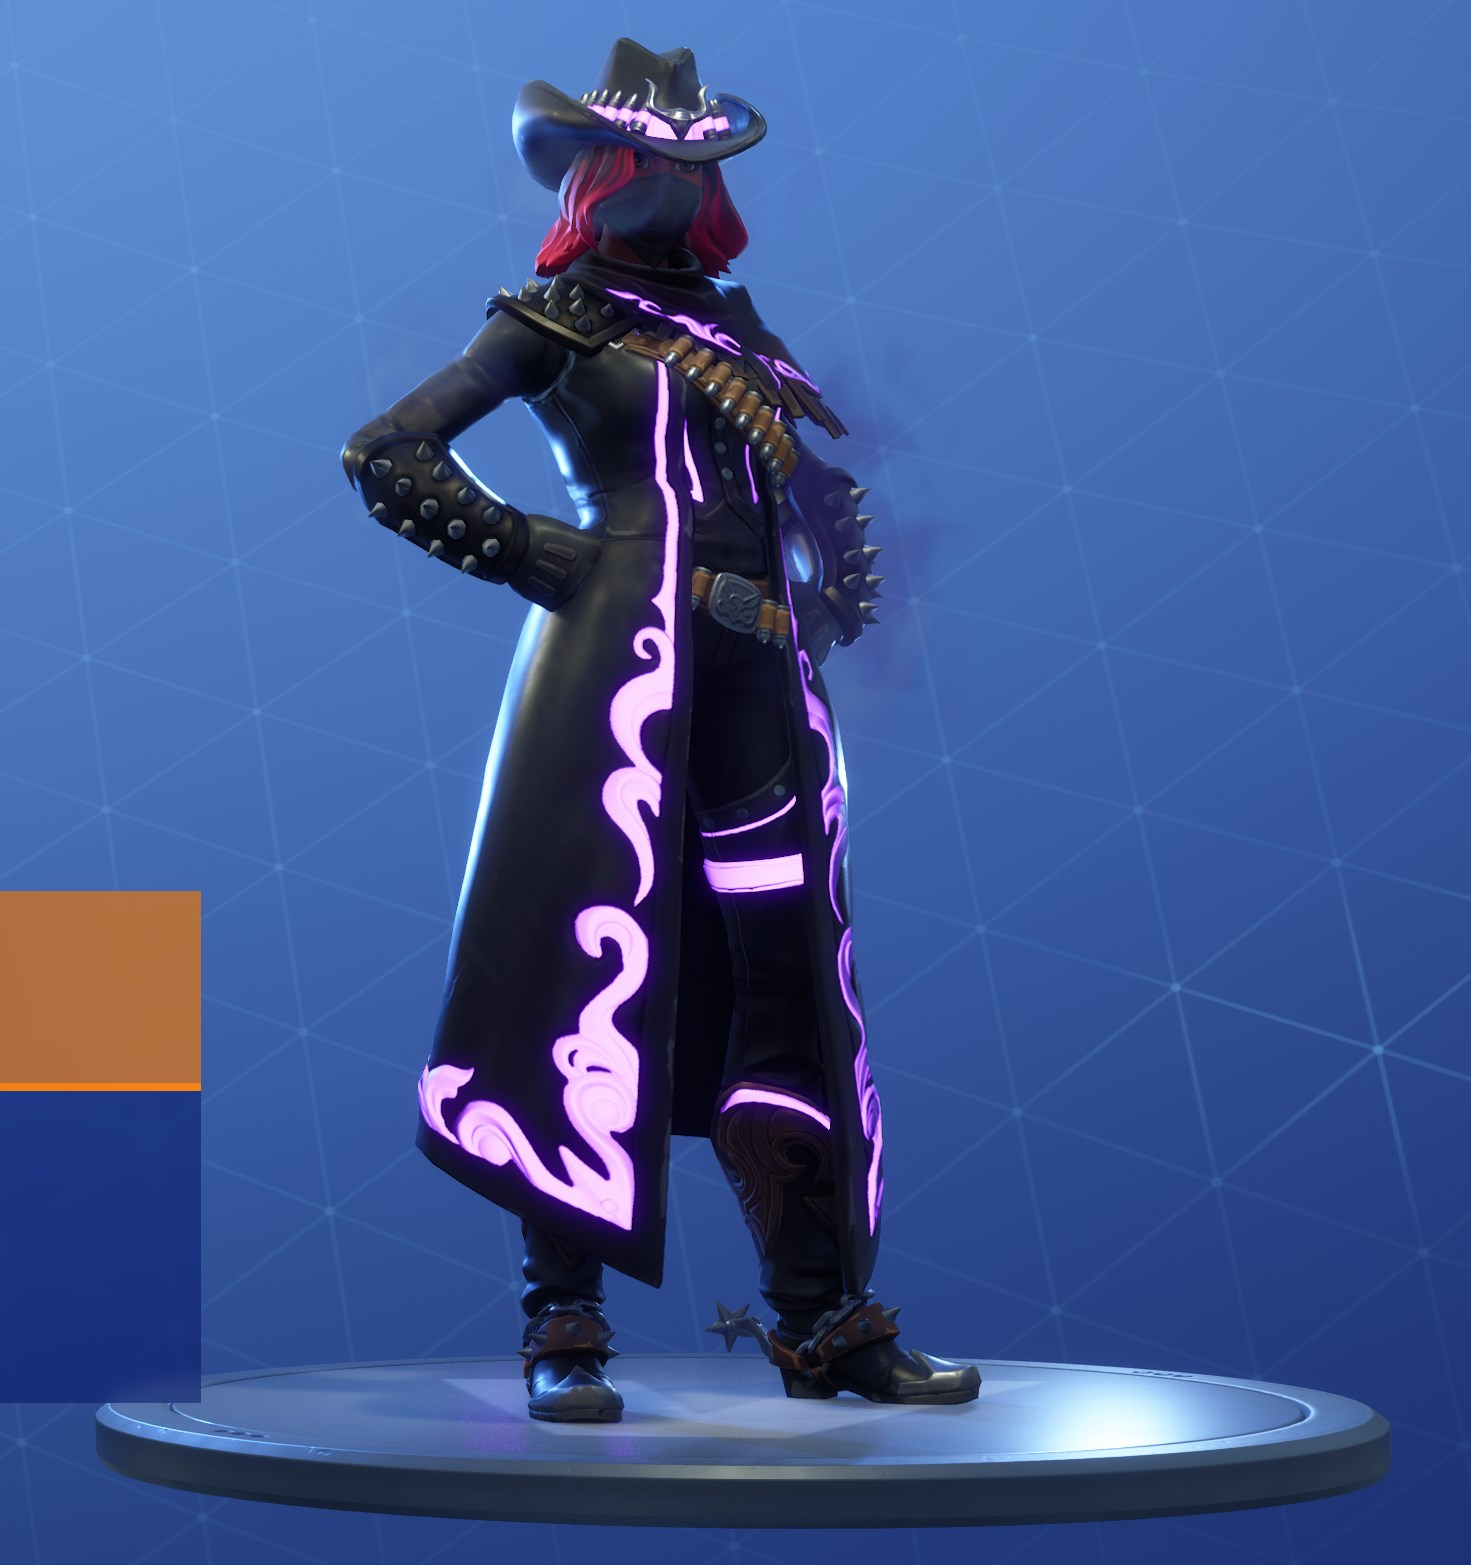 Fortnite Calamity Skin | Legendary Outfit - Fortnite Skins